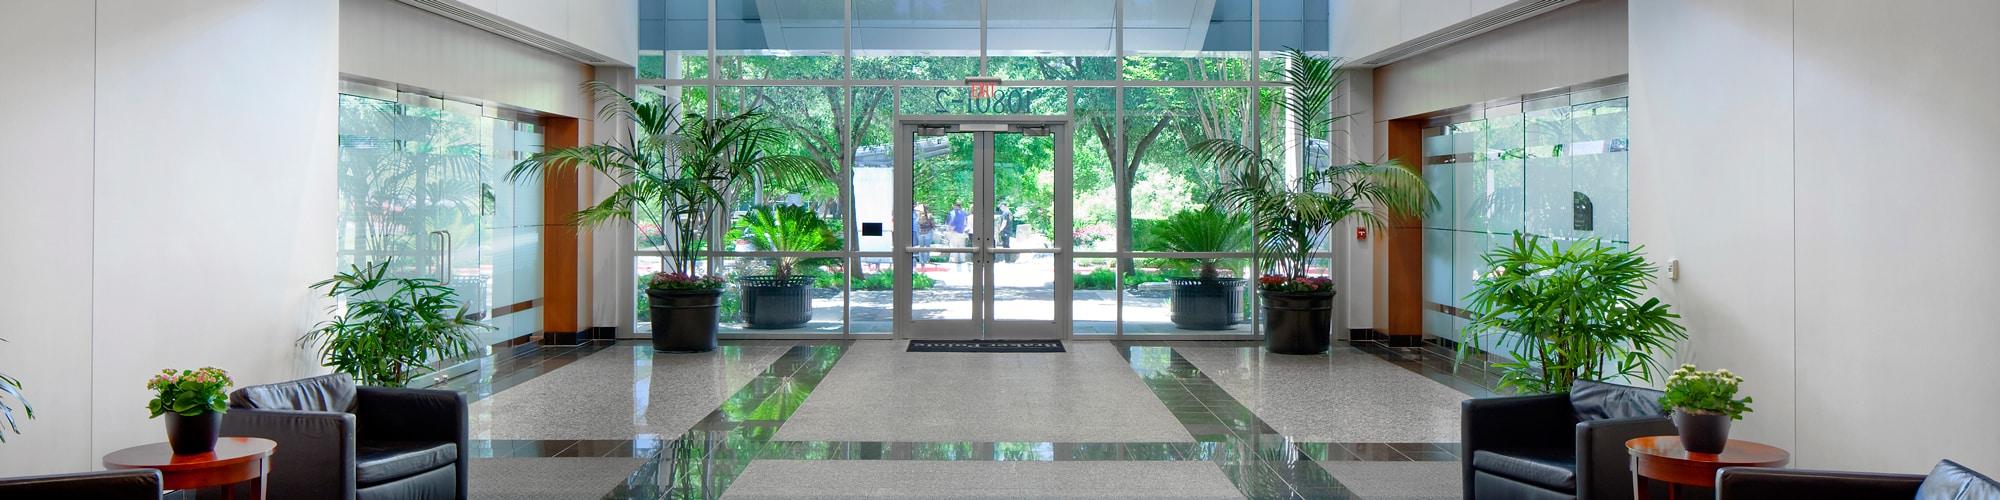 Braker Pointe I & II Lobby | 10801 N. Mopac Expressway in Austin, Texas